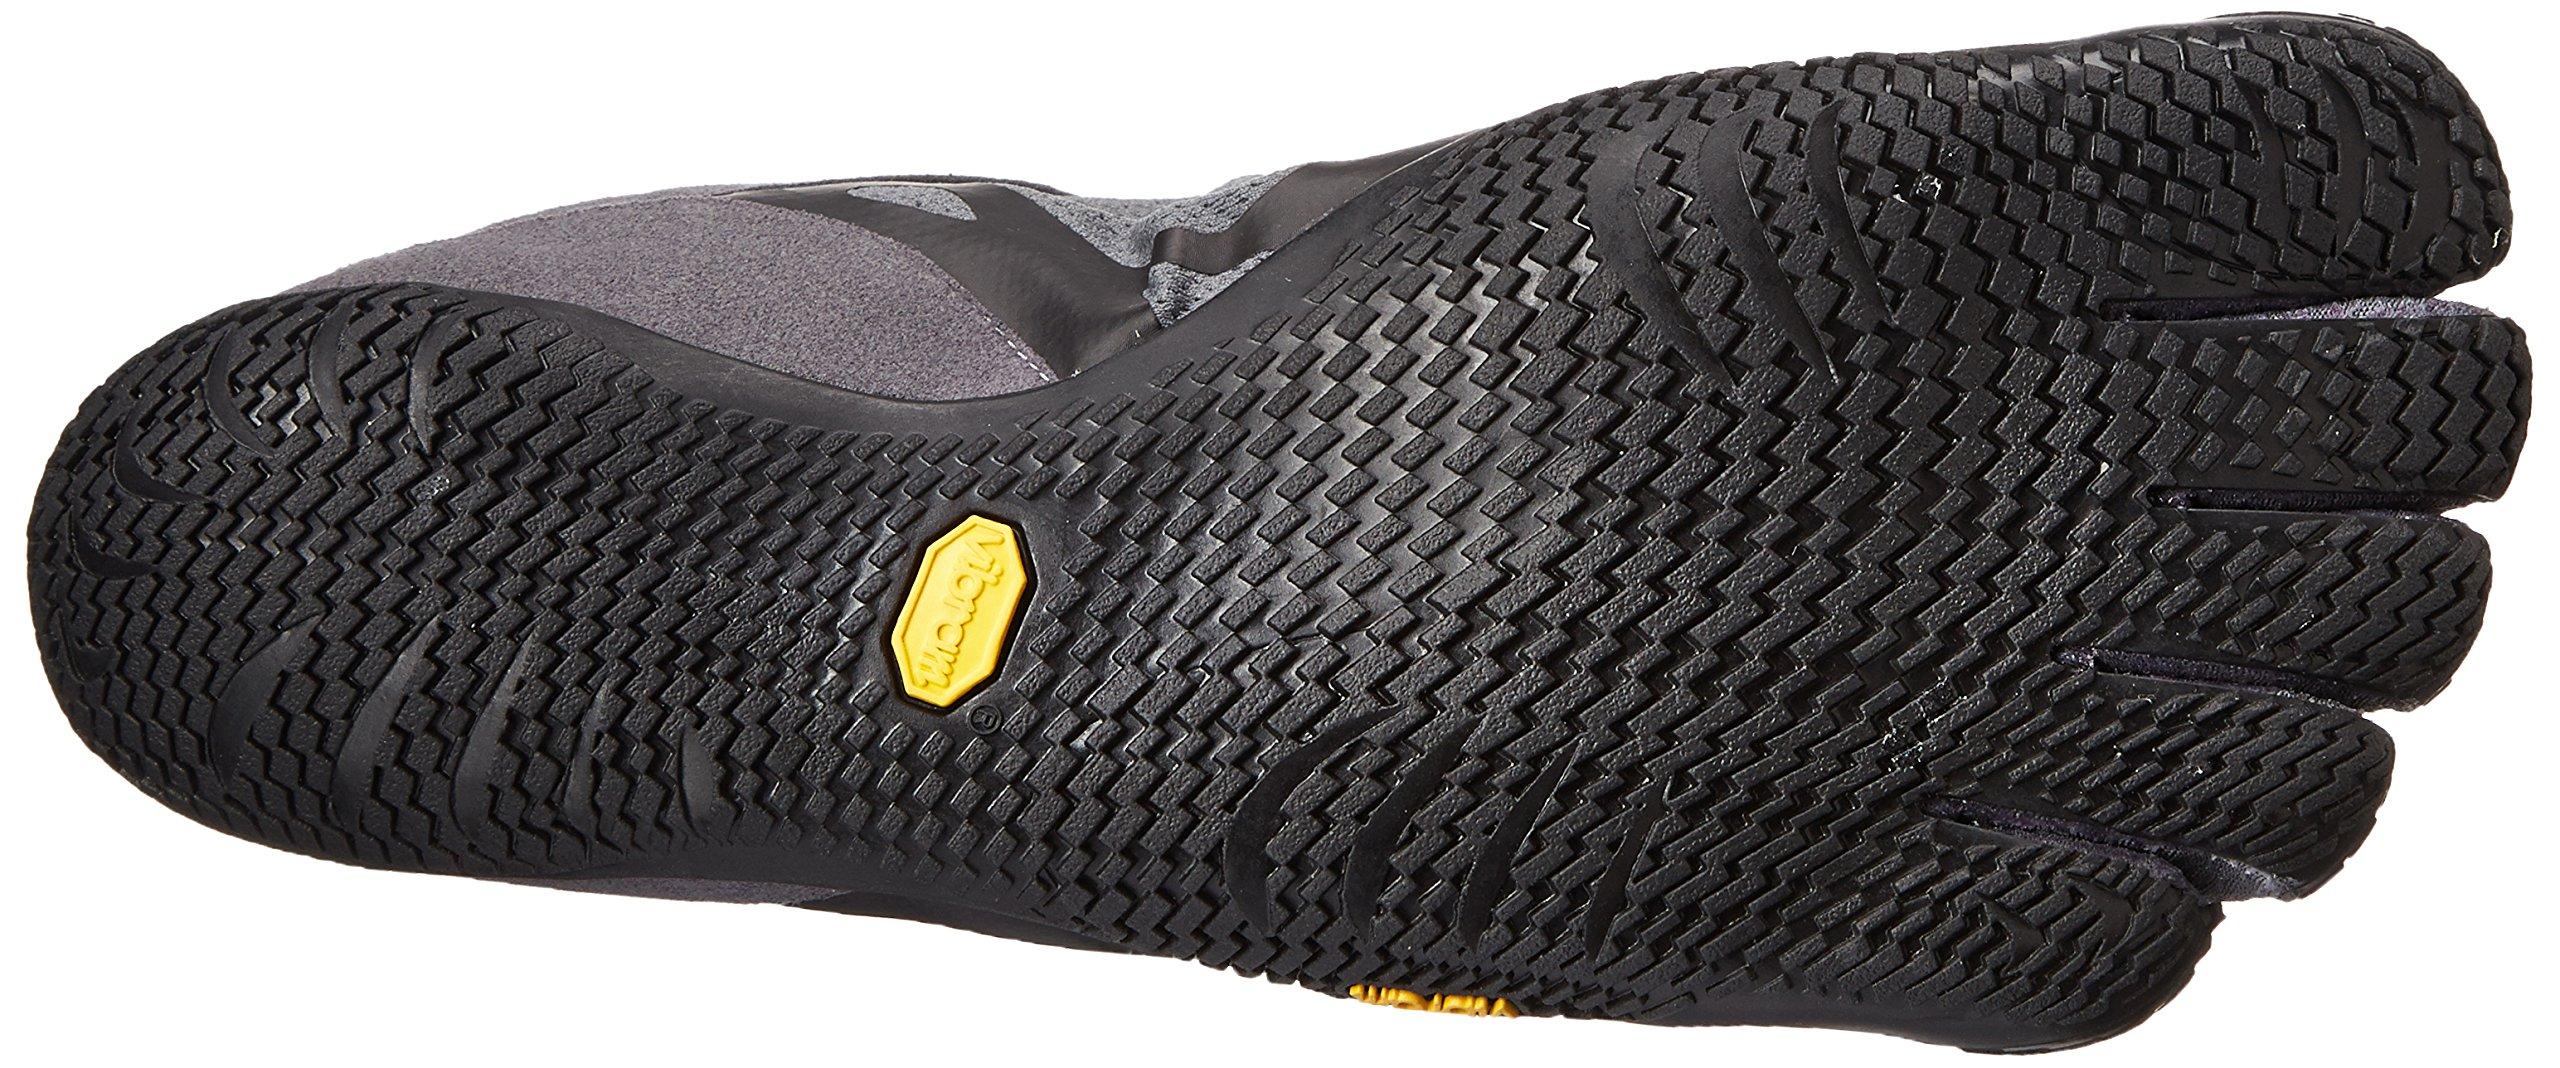 Vibram Men's KSO EVO Cross Training Shoe,Grey/Black,41 EU/8.5-9.0 M US by Vibram (Image #3)